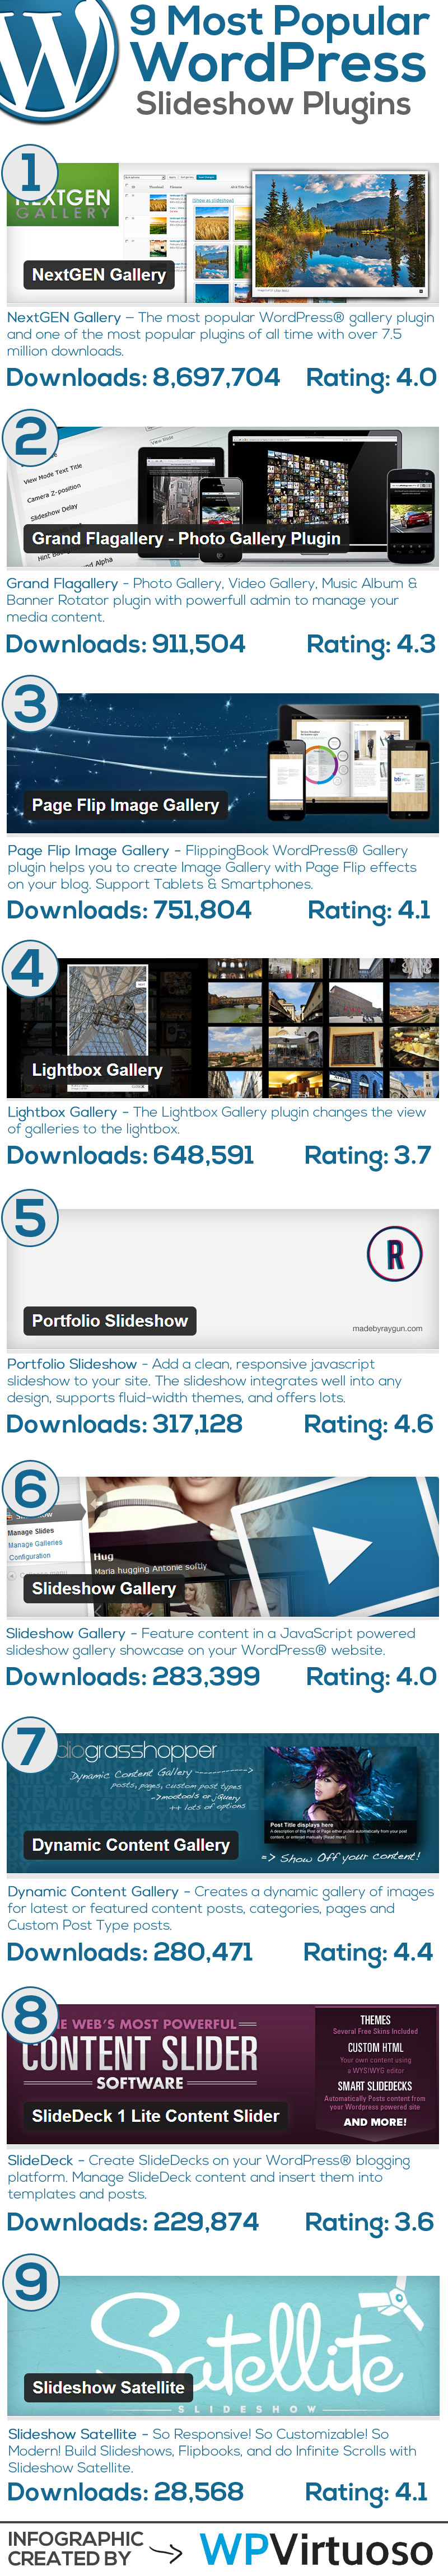 Best-Wordpress-Slideshow-Plugins-Infographic